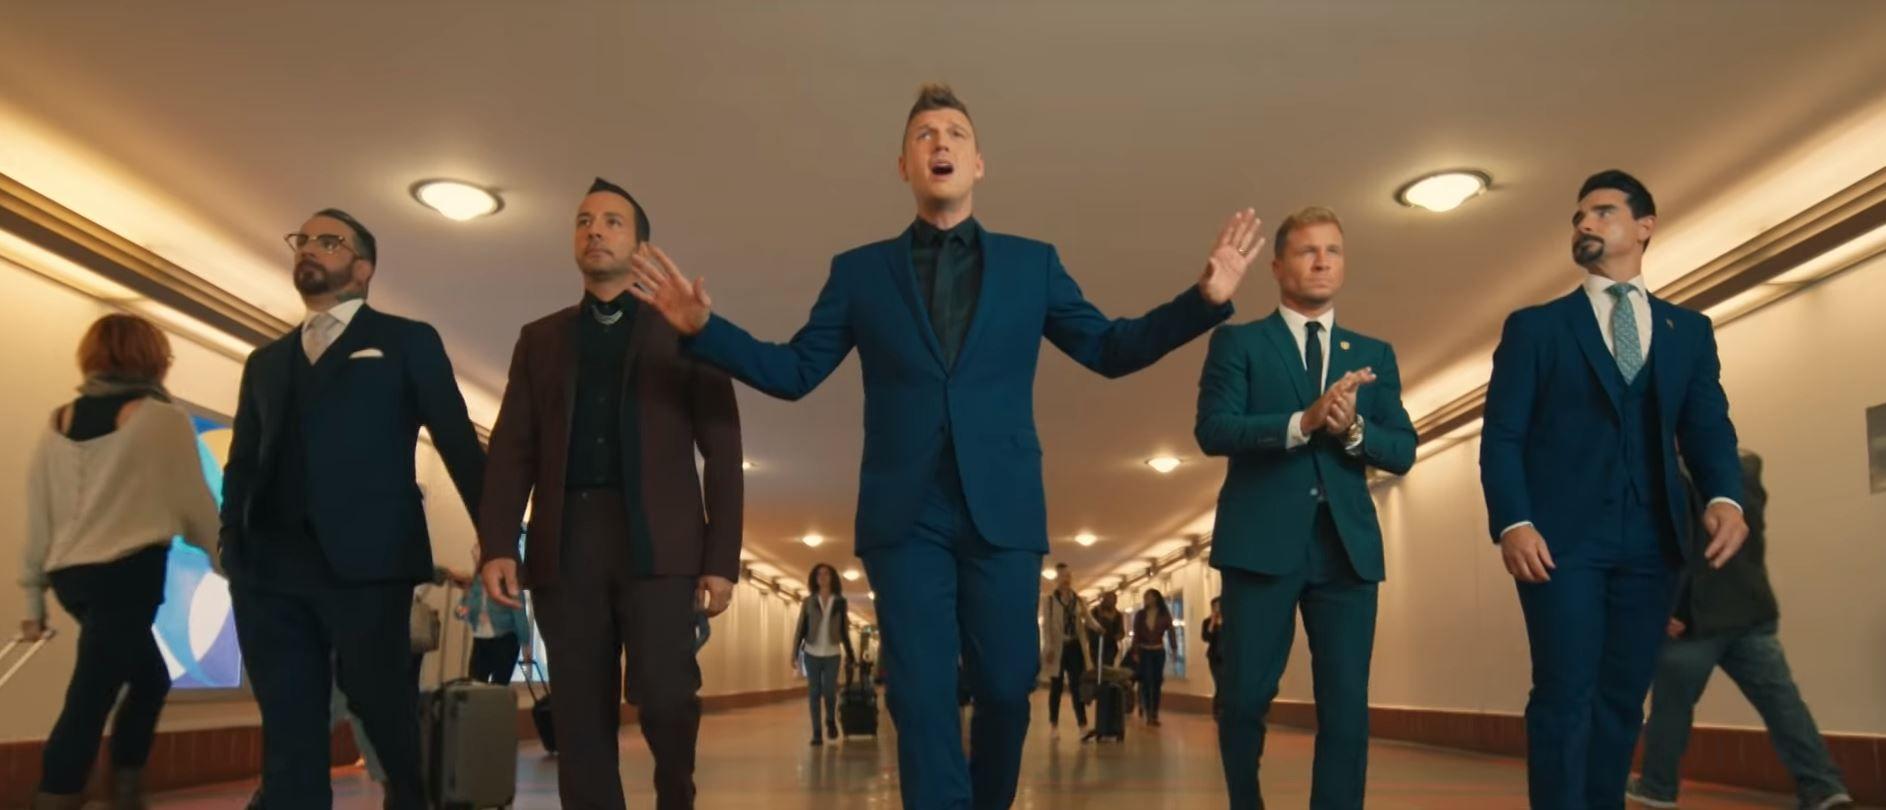 Backstreet Boys Chances Group